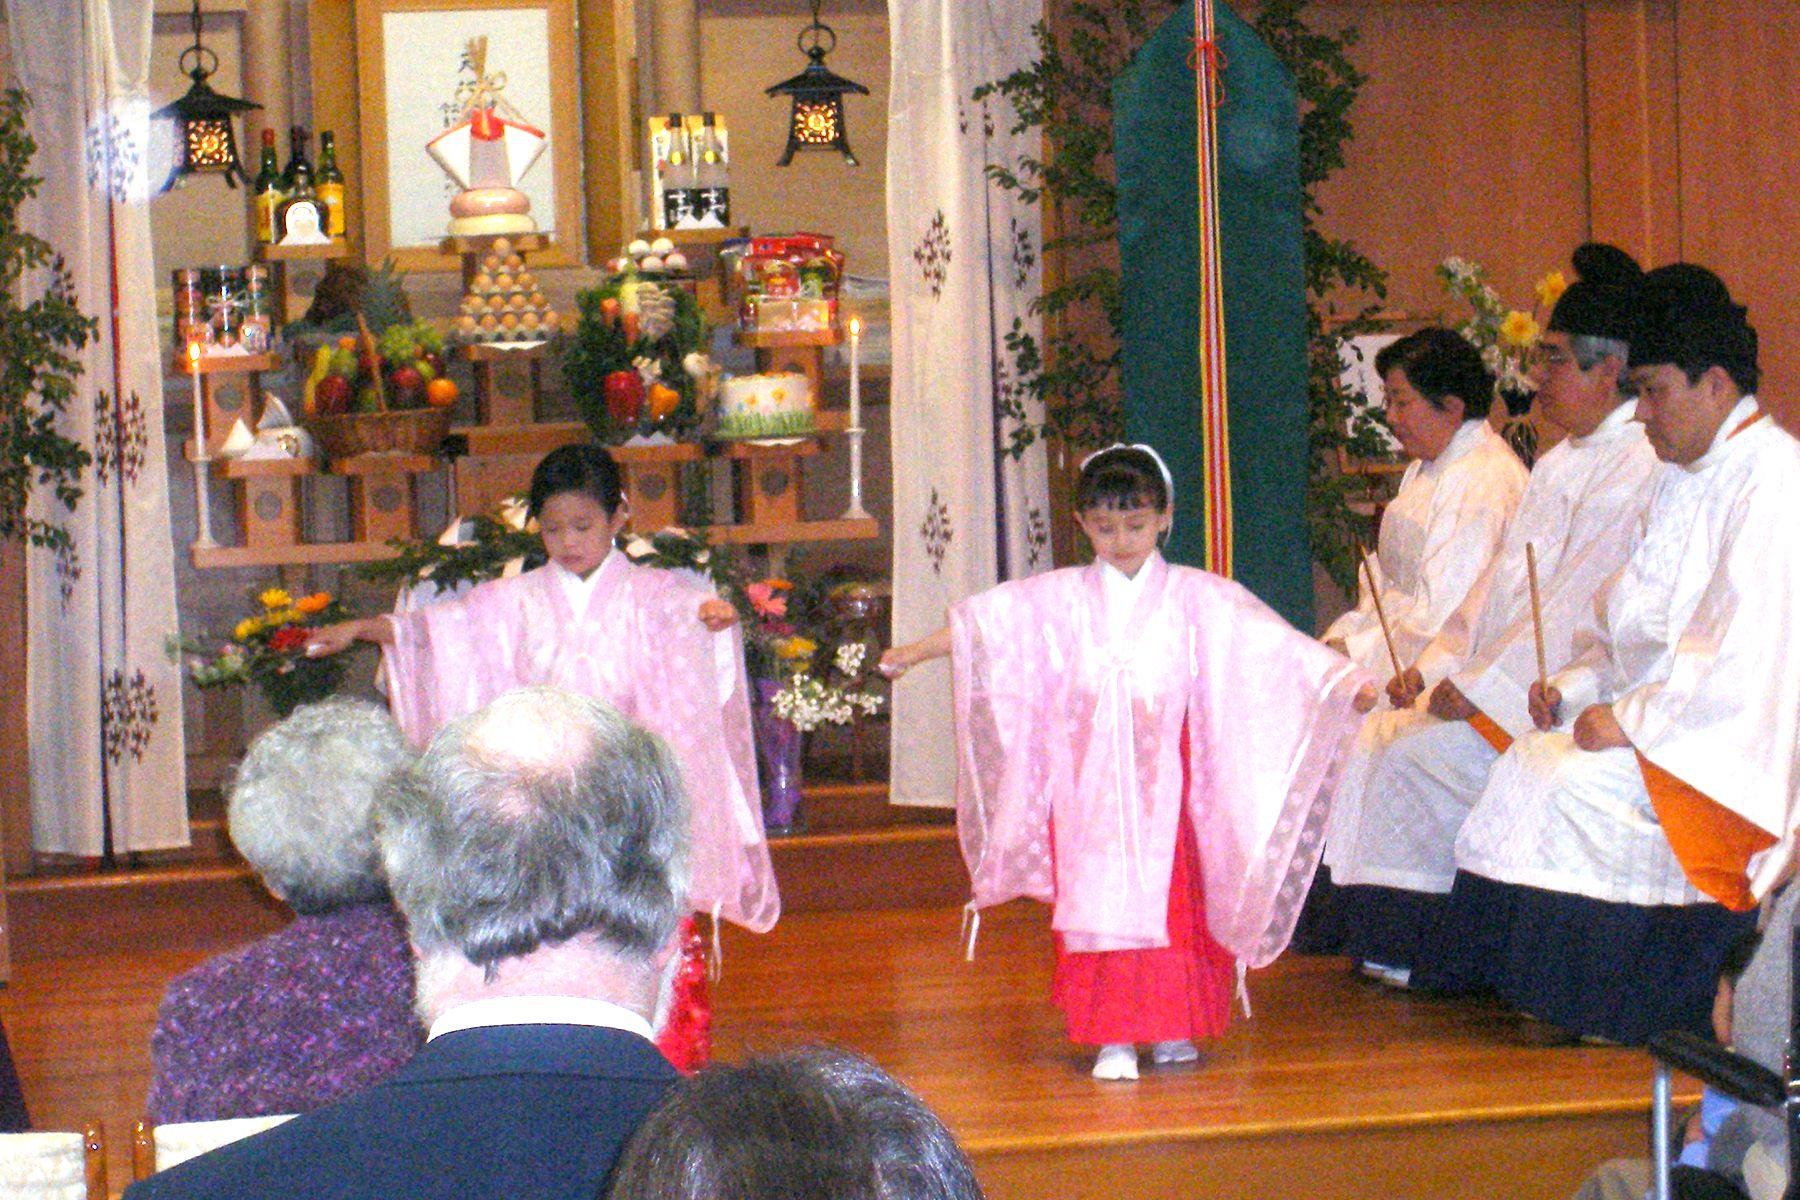 Spring Grand Ceremony - Offering of Sacred Kibimai Dance